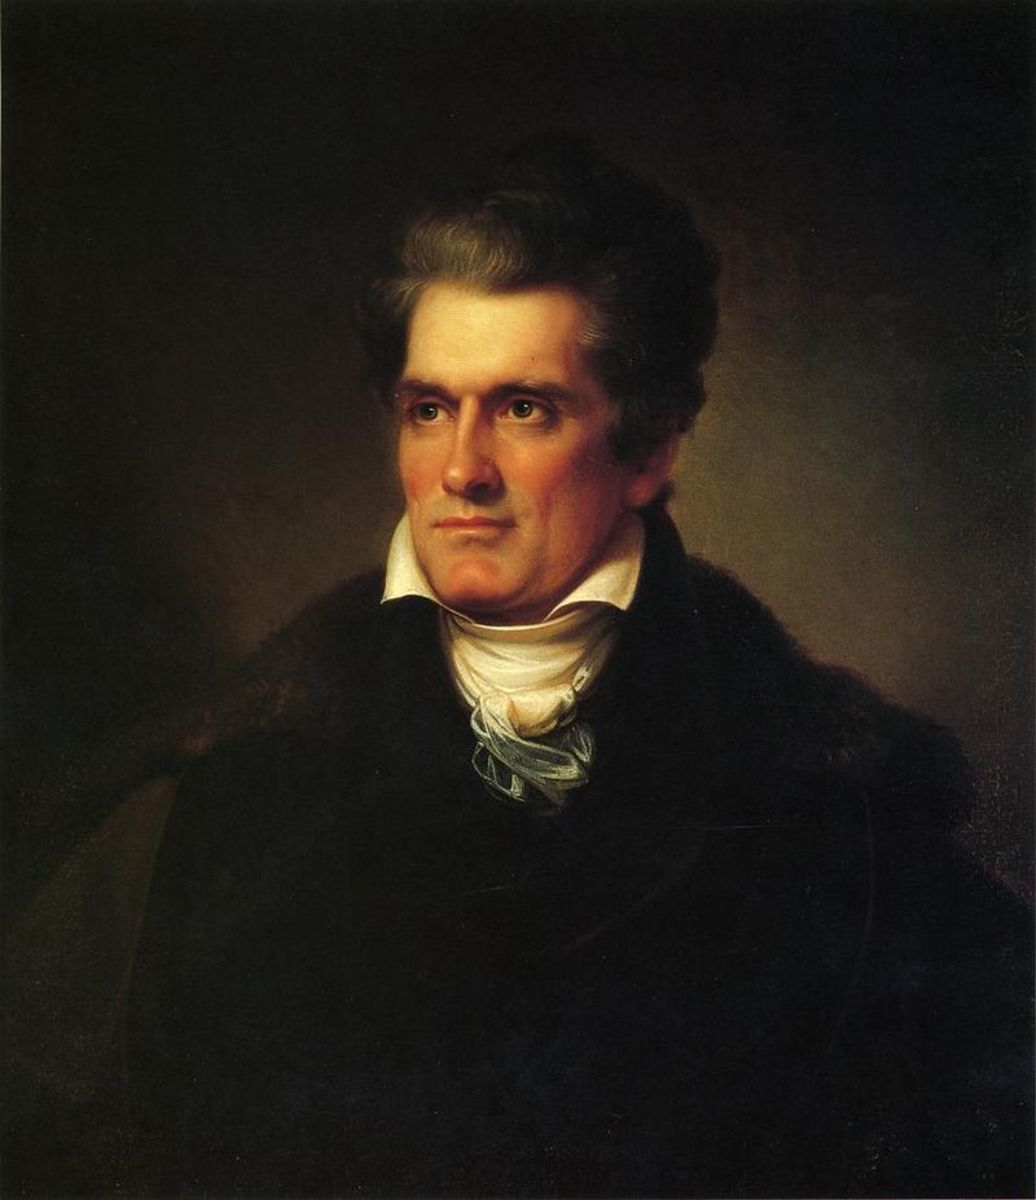 John C. Calhoun: Seventh Vice President of the United States